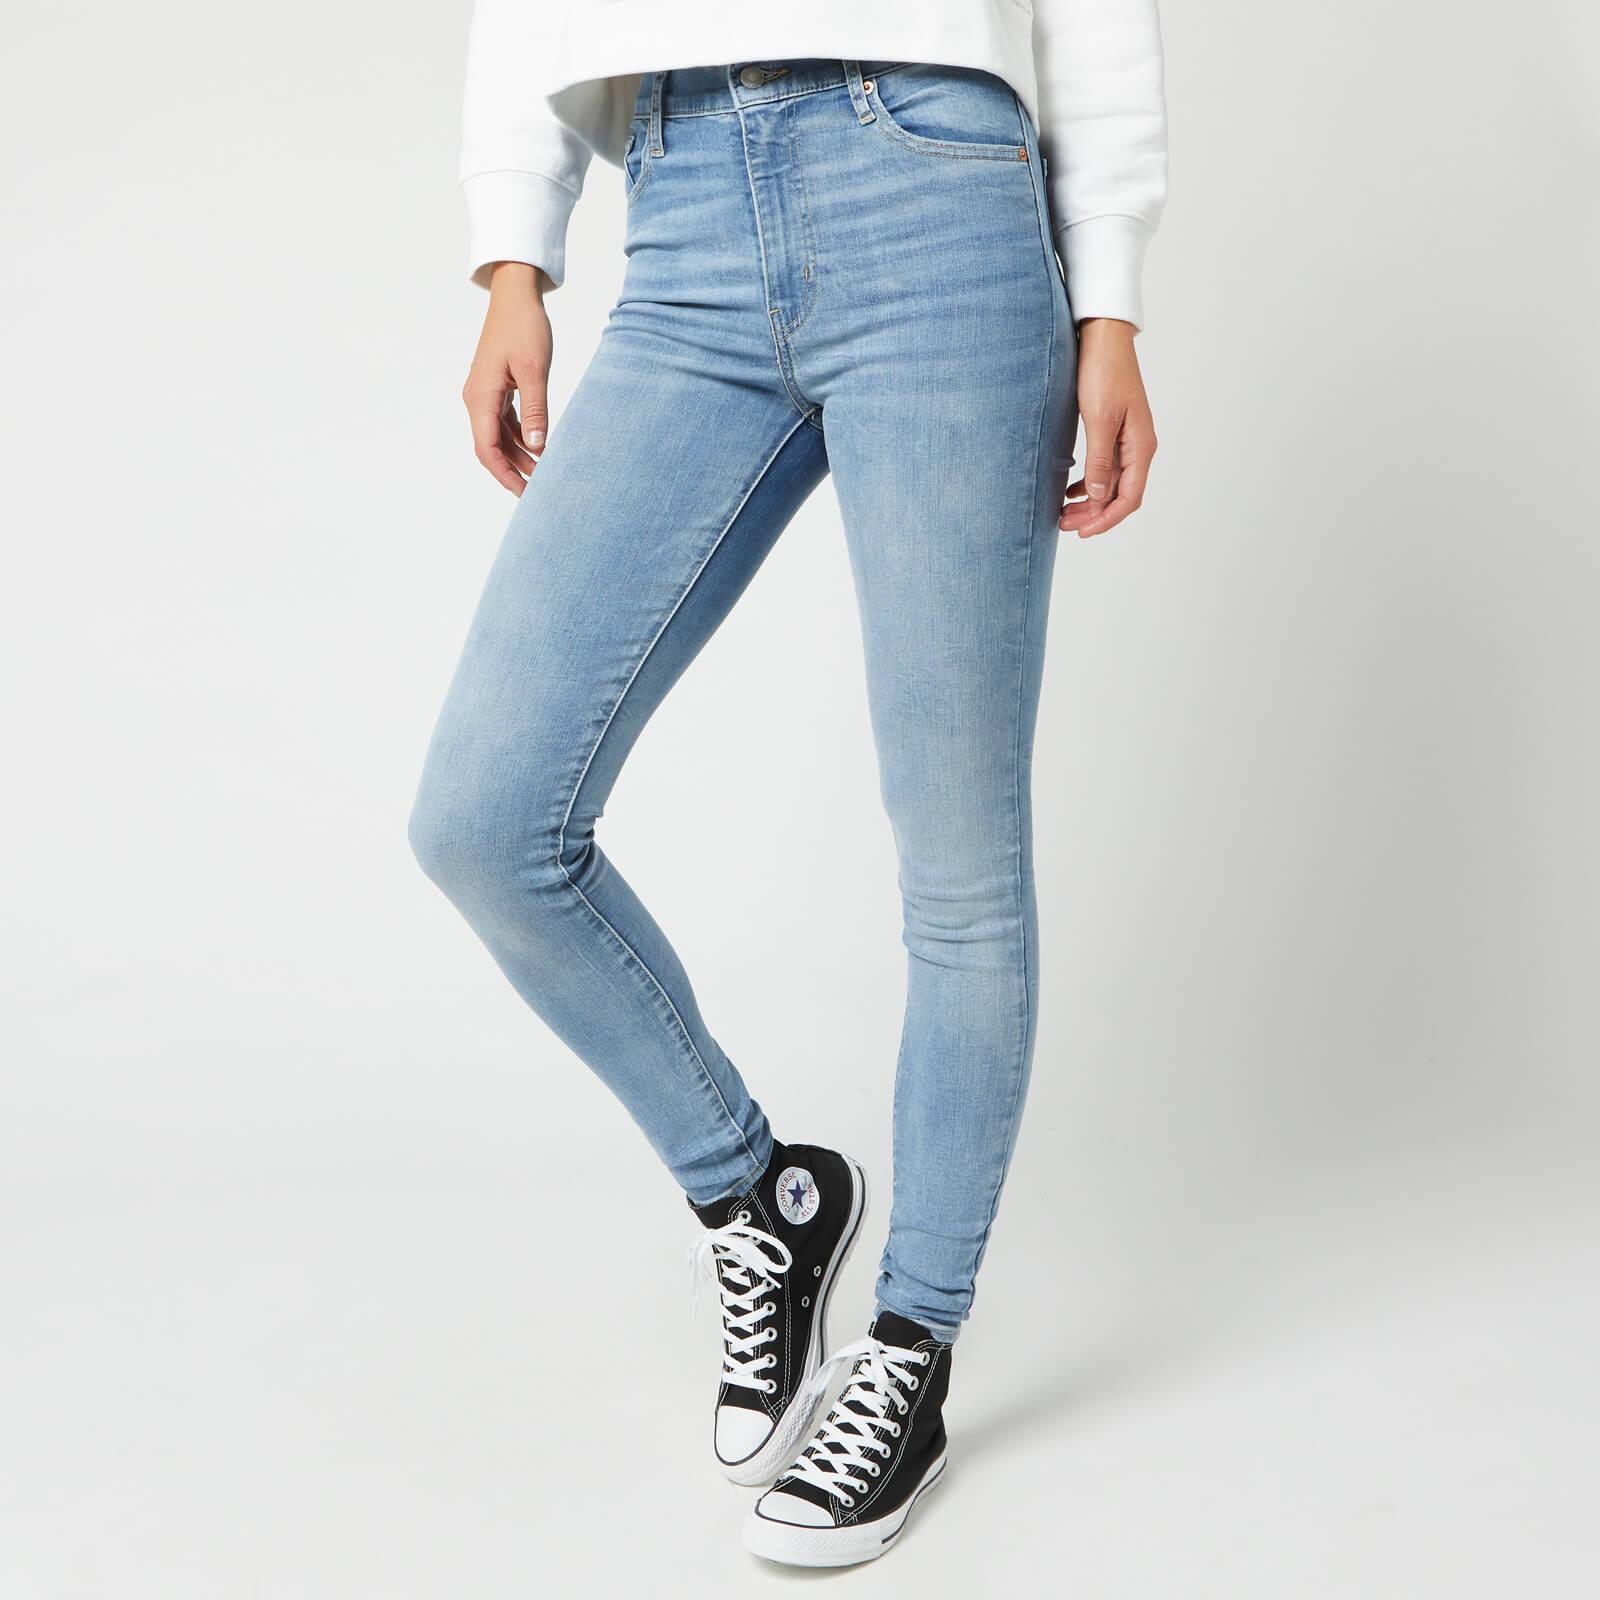 Levi's s Mile High Super Skinny Jeans - You Got Me - W29/L32